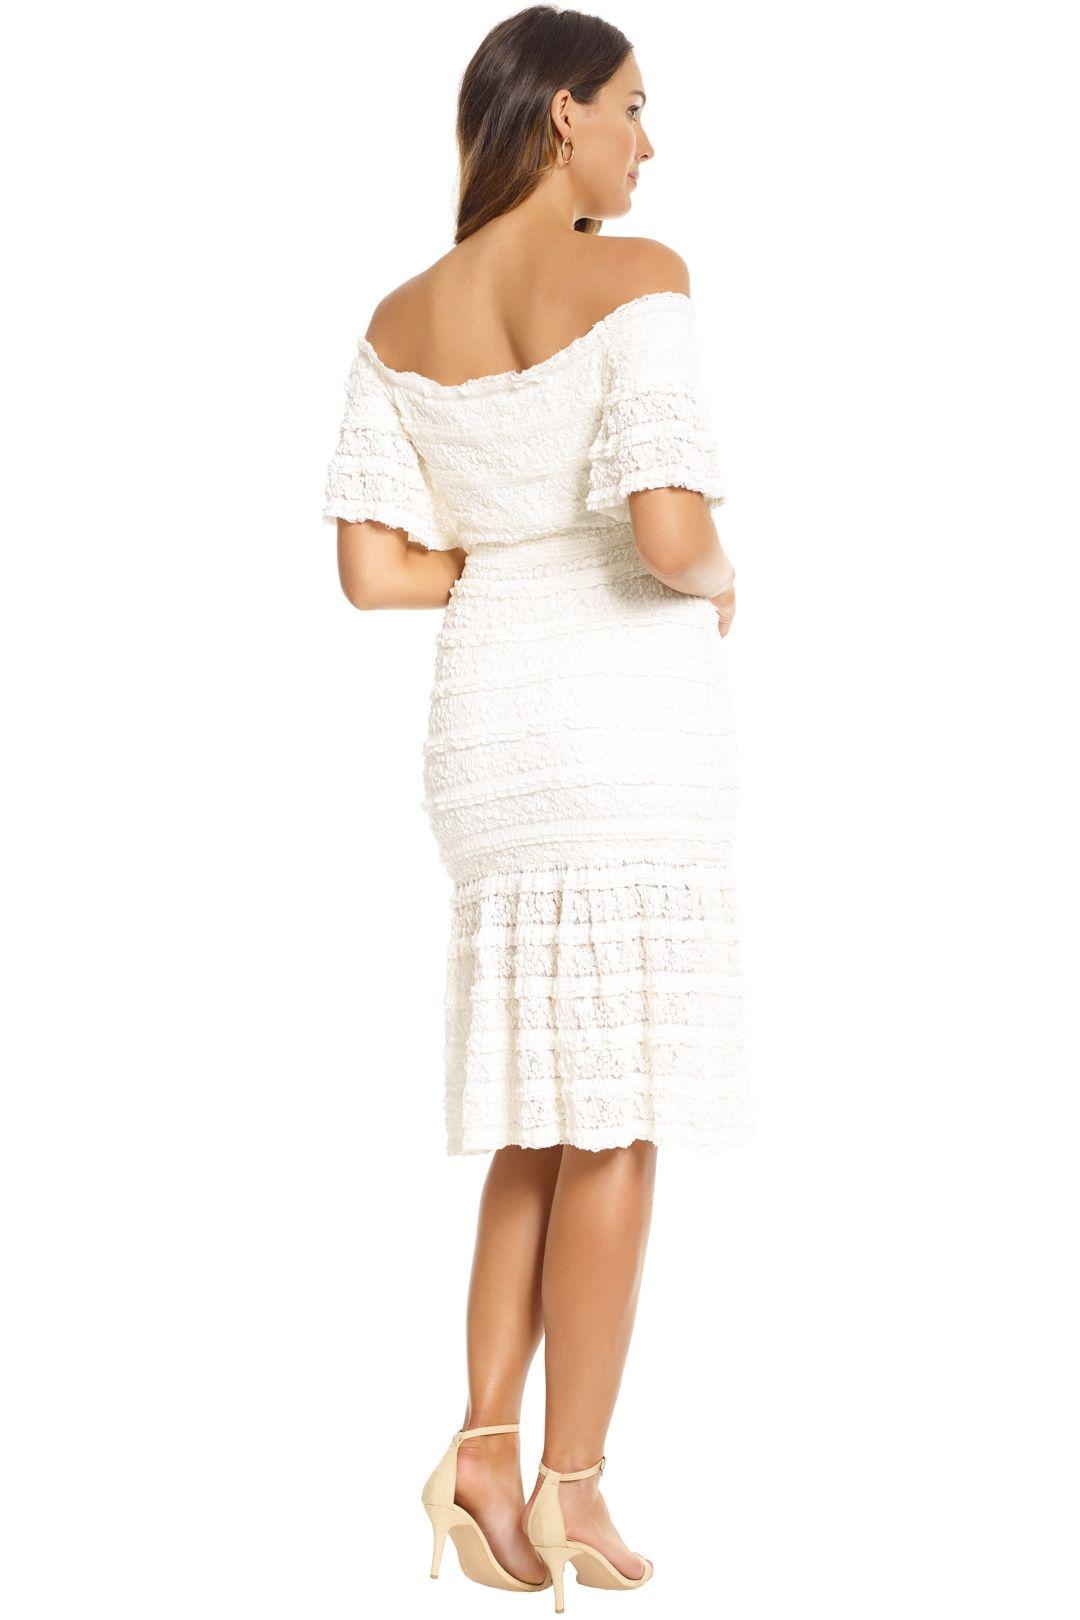 Saylor - Malinda Dress - White - Back